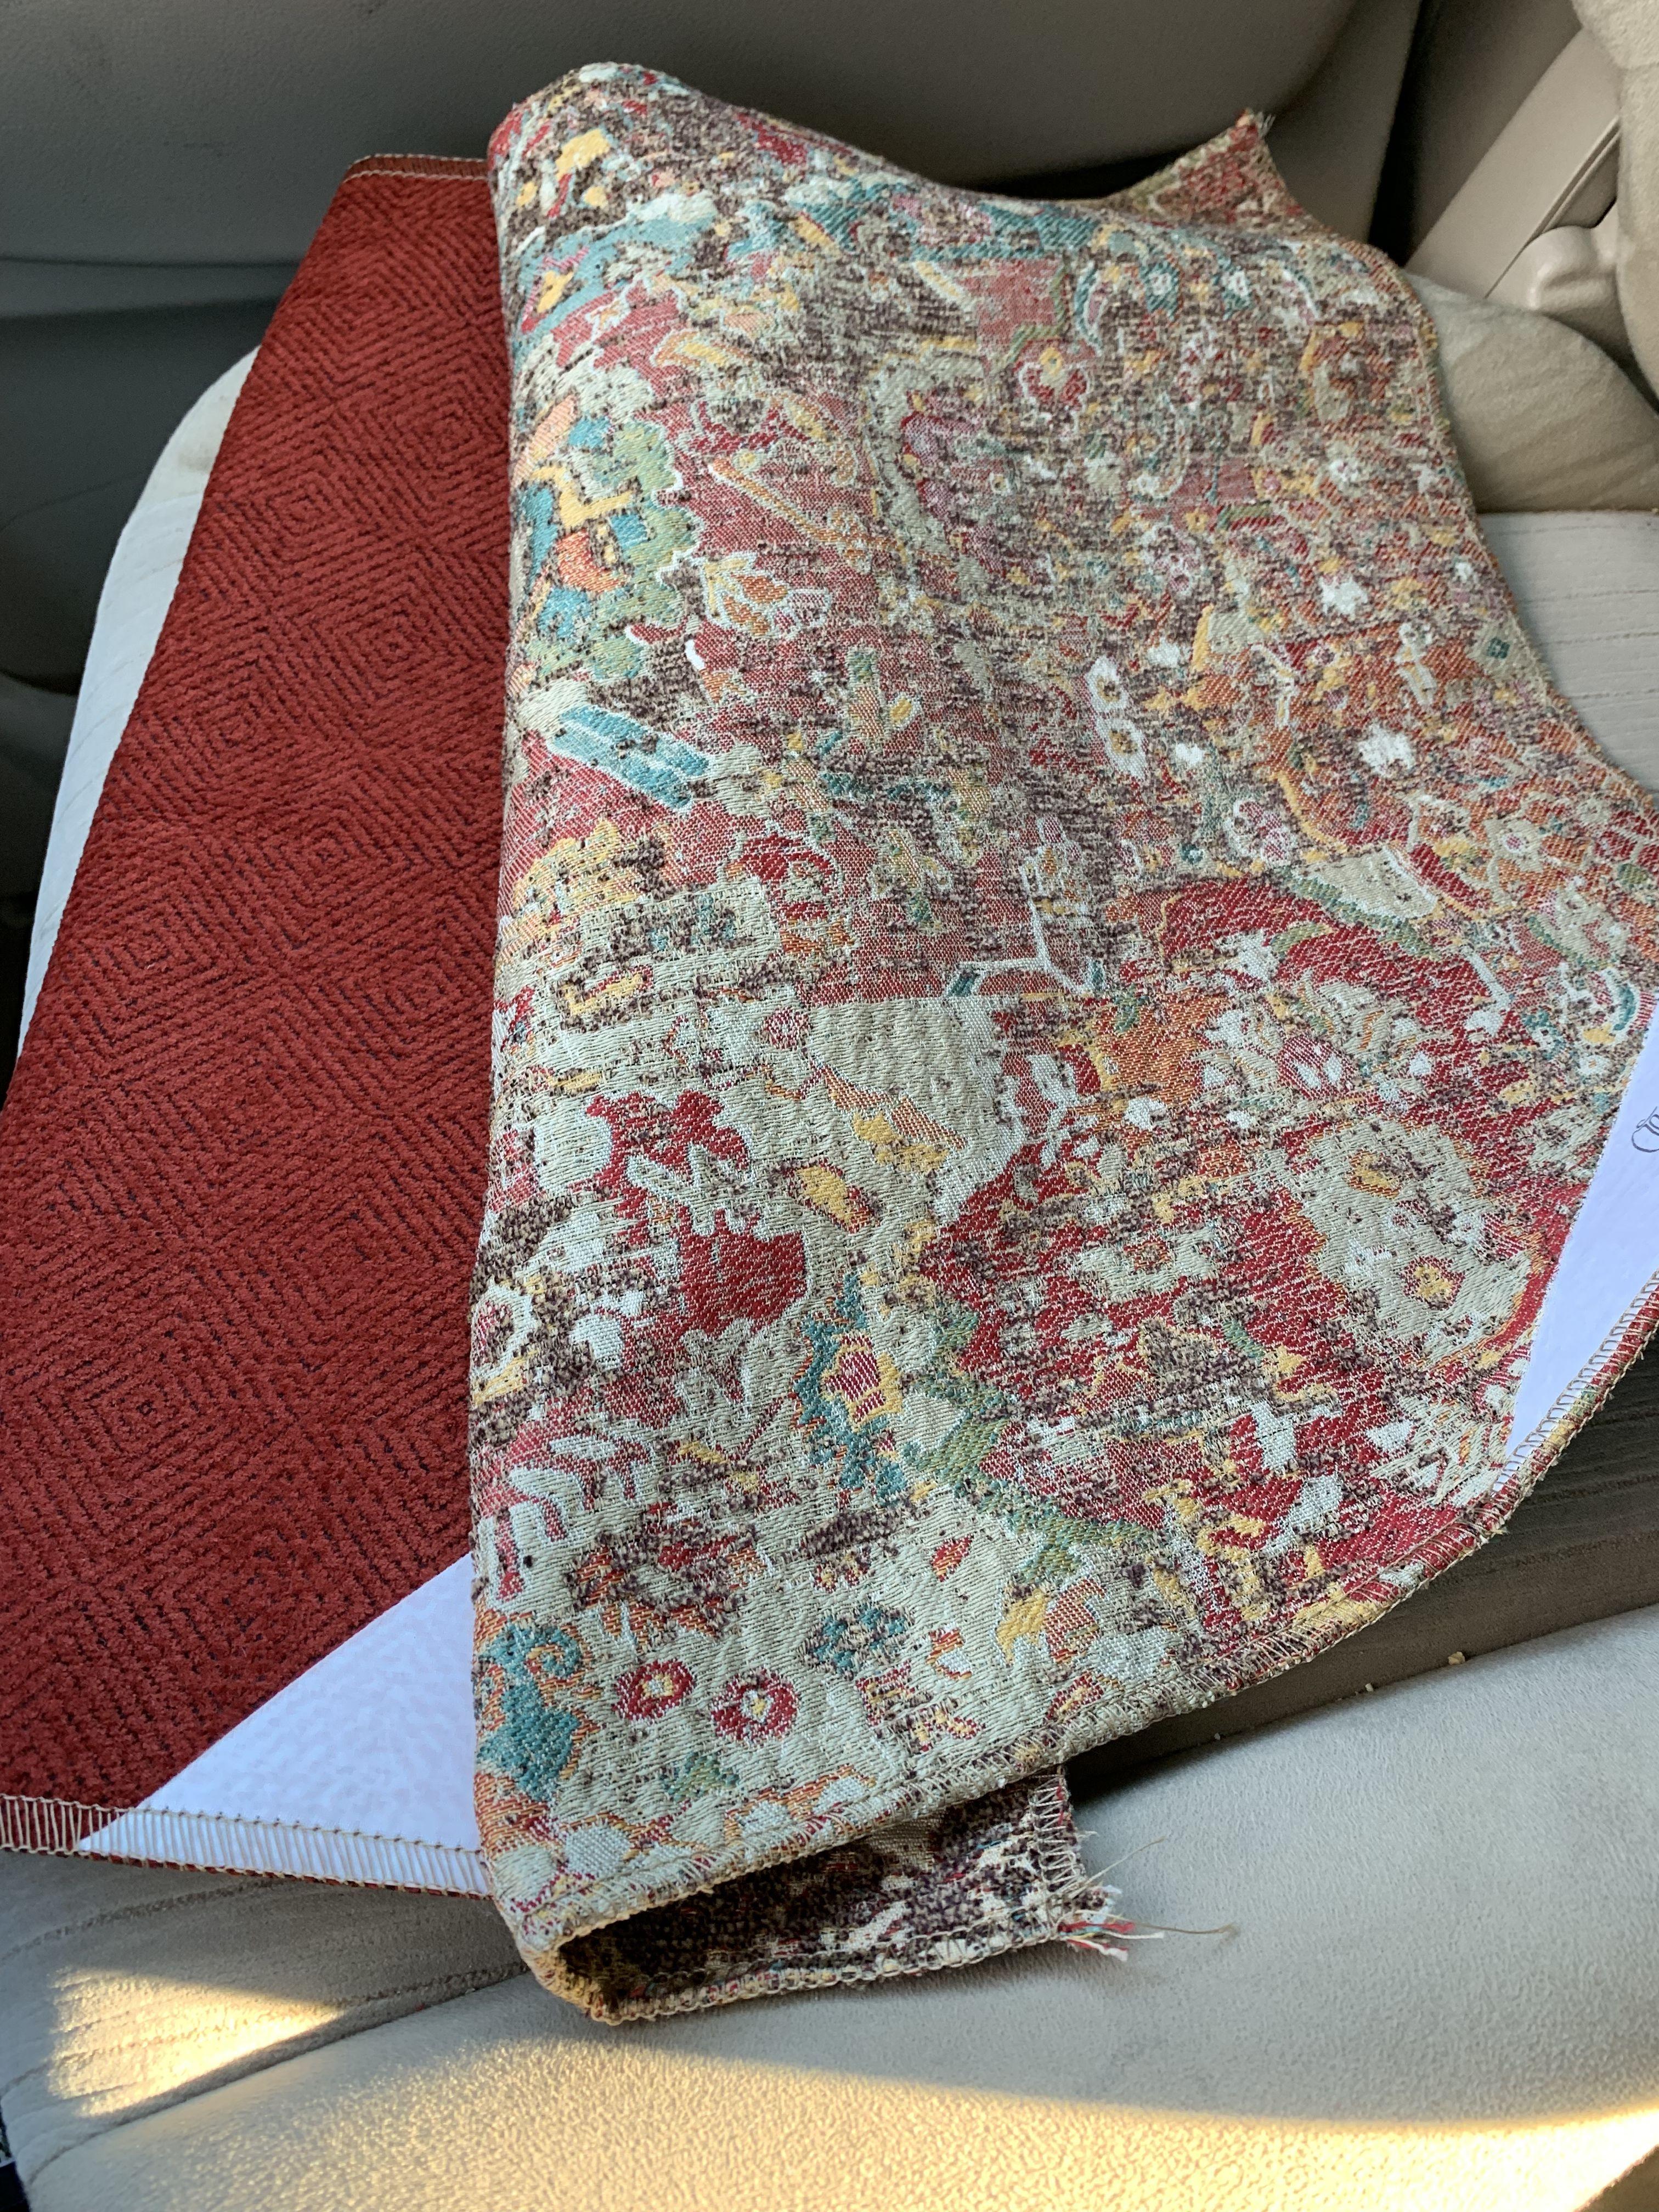 Crypton Fabric On Sofa Print On Pillow Front Crypton Fabric